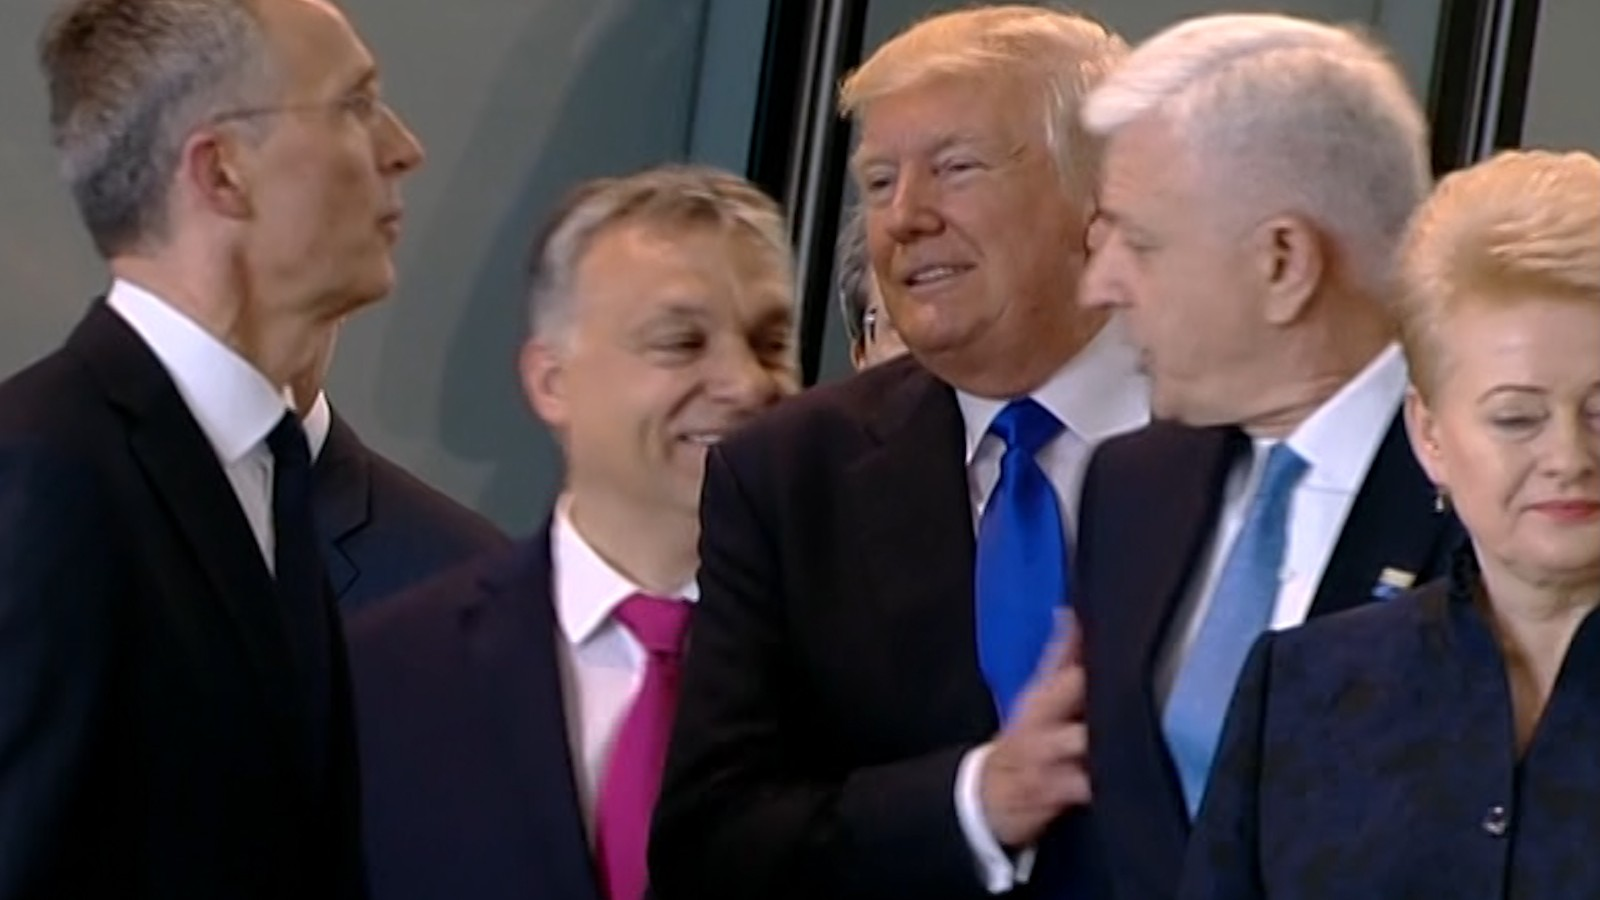 USA-2017-Taormina-Italia_Trump-shove-prime-minister-montenegro-nato-OTAN_amenimario